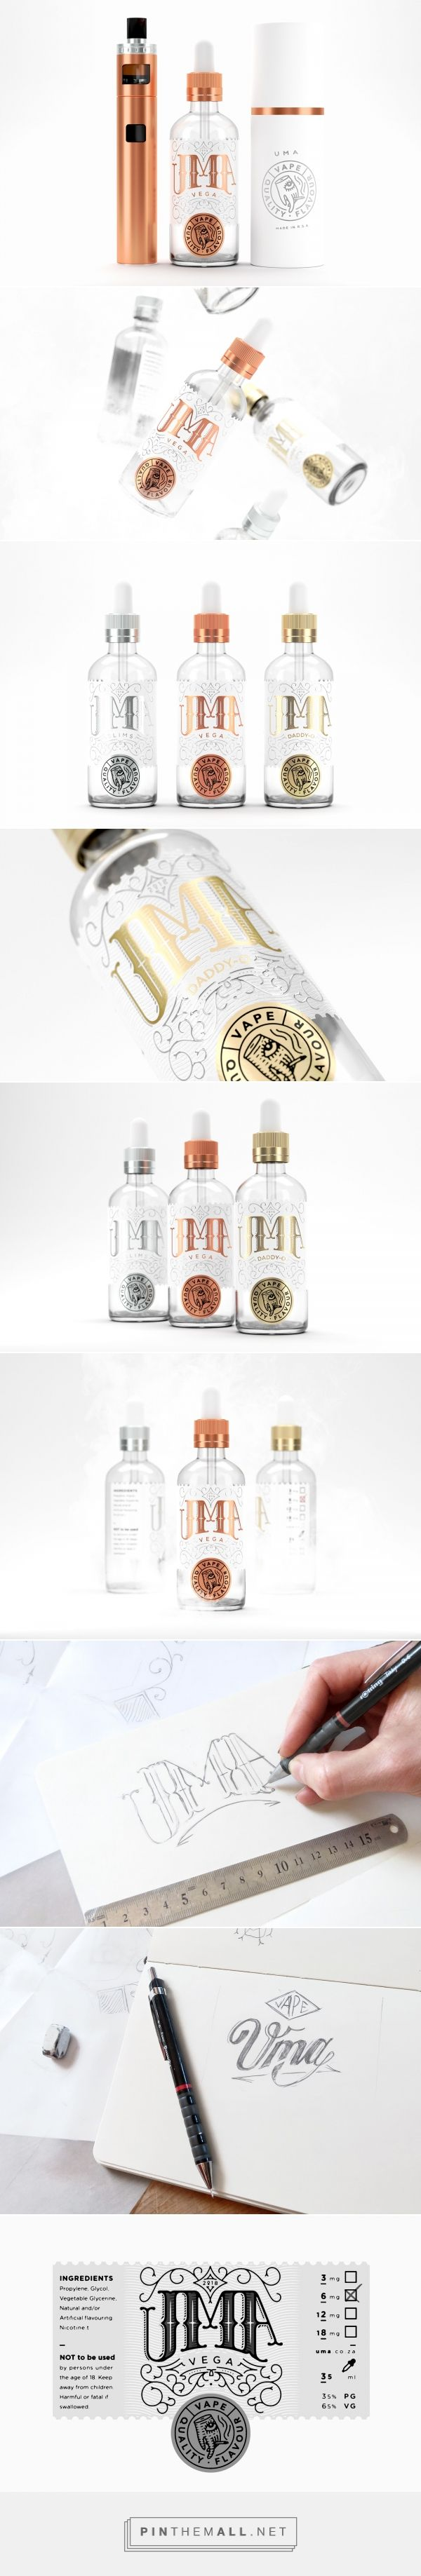 Uma vape liquid packaging design by The Motel - http://www.packagingoftheworld.com/2017/12/uma.html